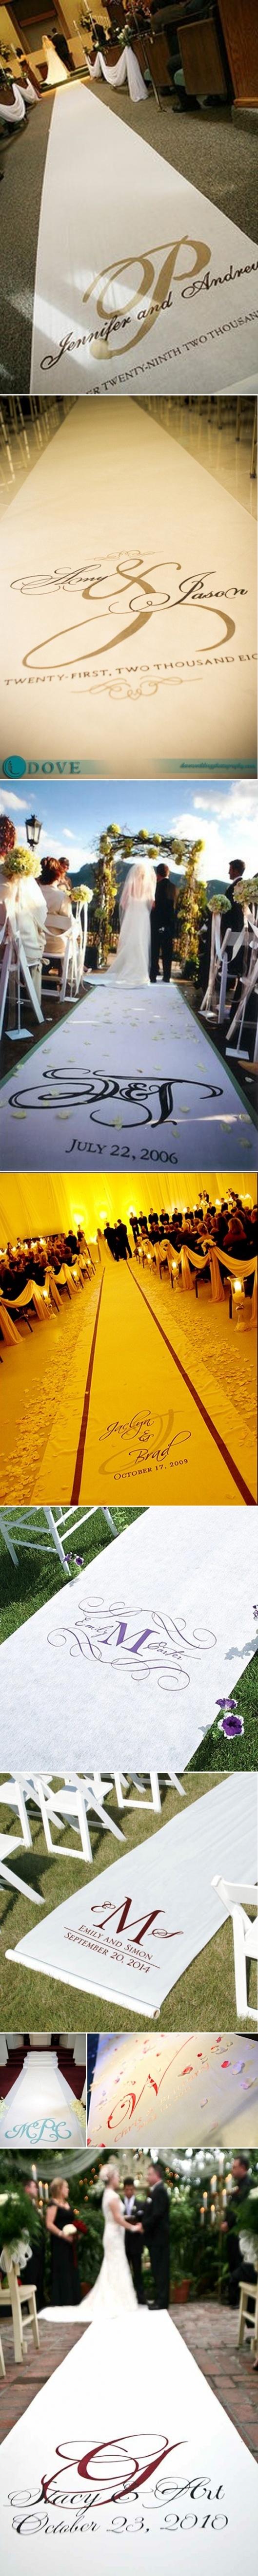 aisle runnersAisle Runners Sweets, Monograms Ideas, Wedding Aisles, Turquoise Monograms, Personalised Aisle